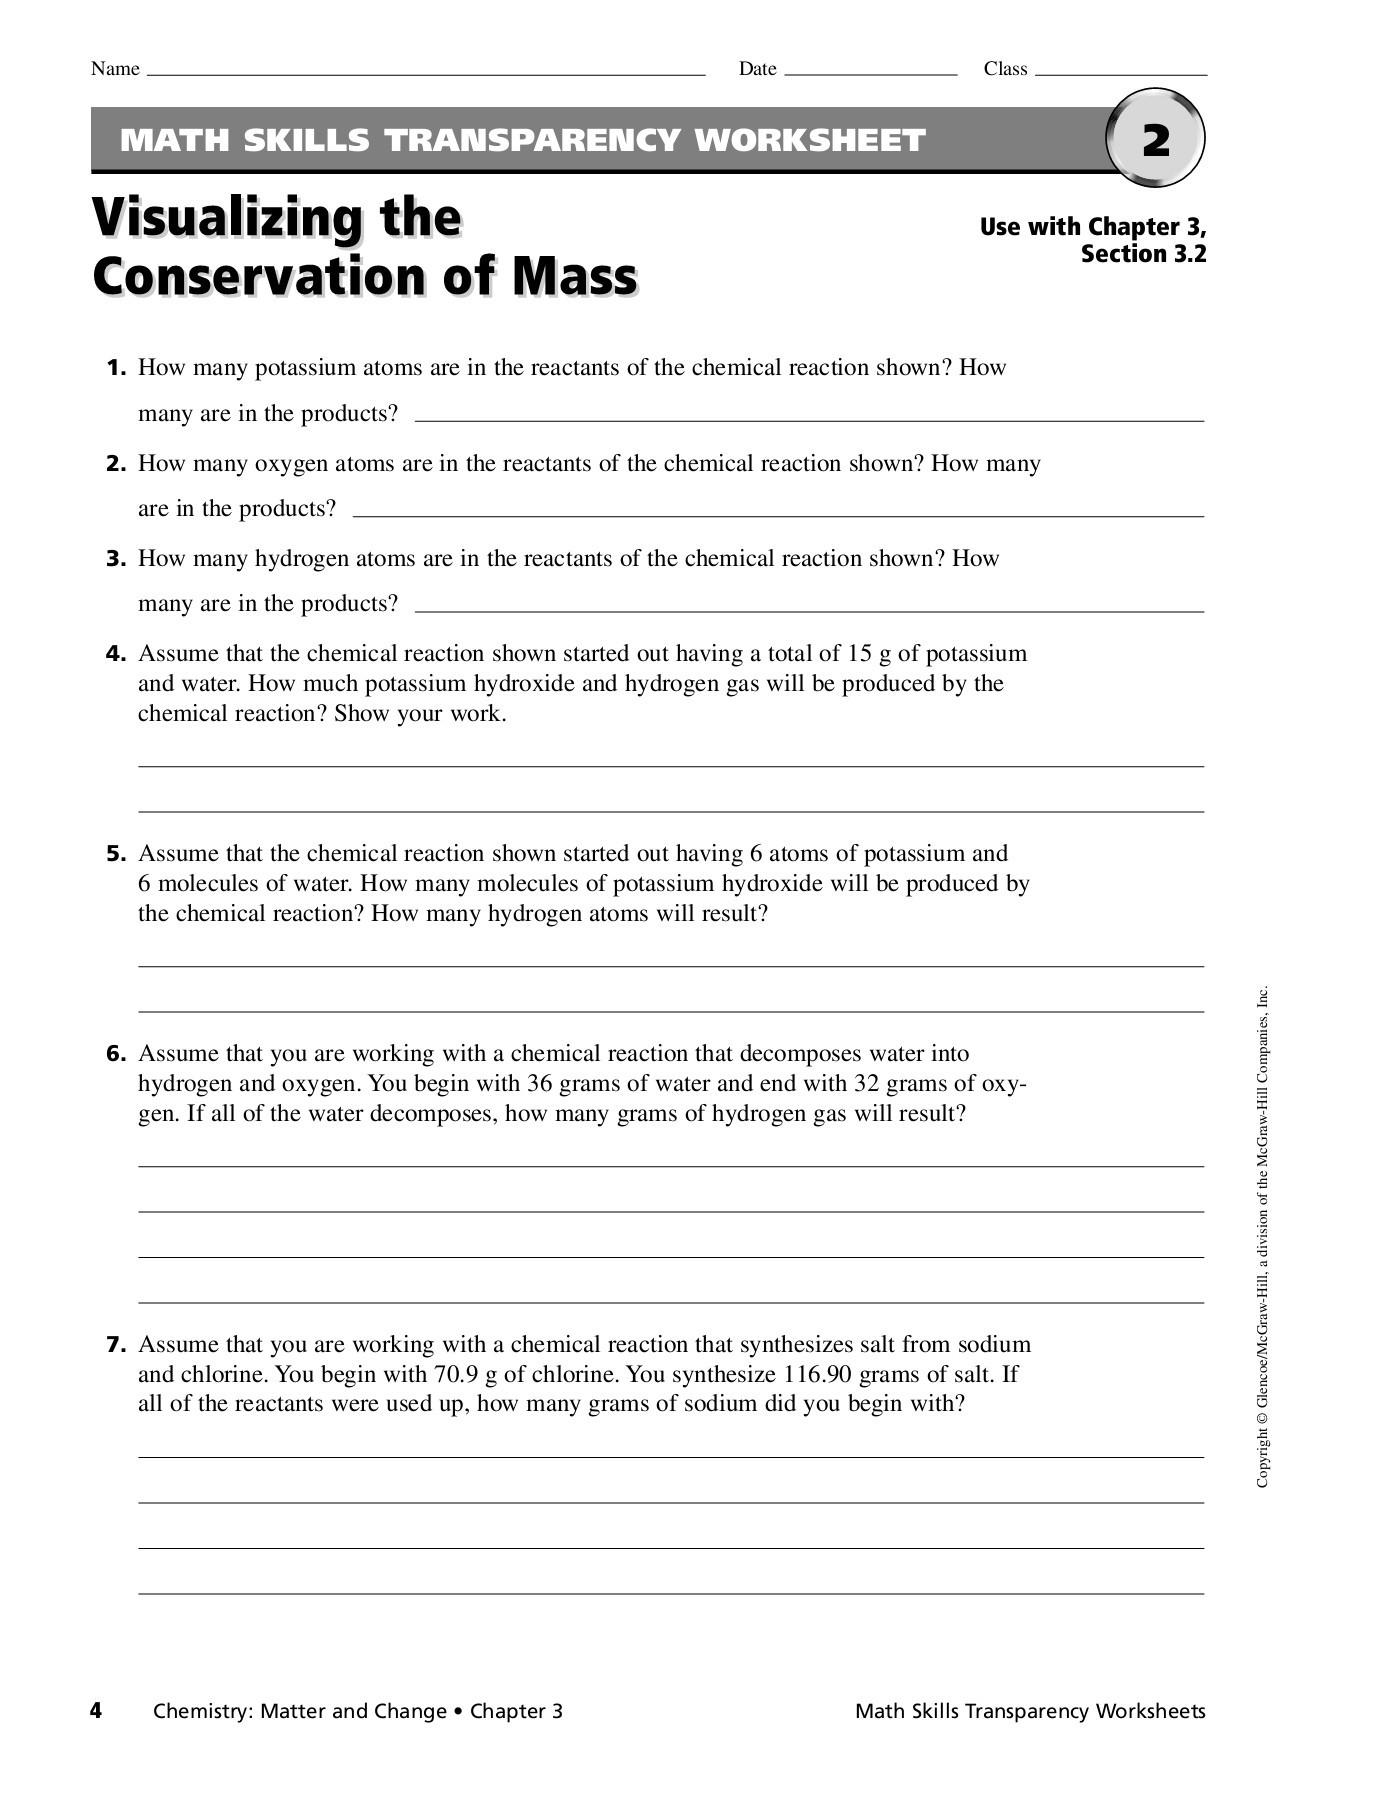 Math Skills Transparency Worksheet Answers